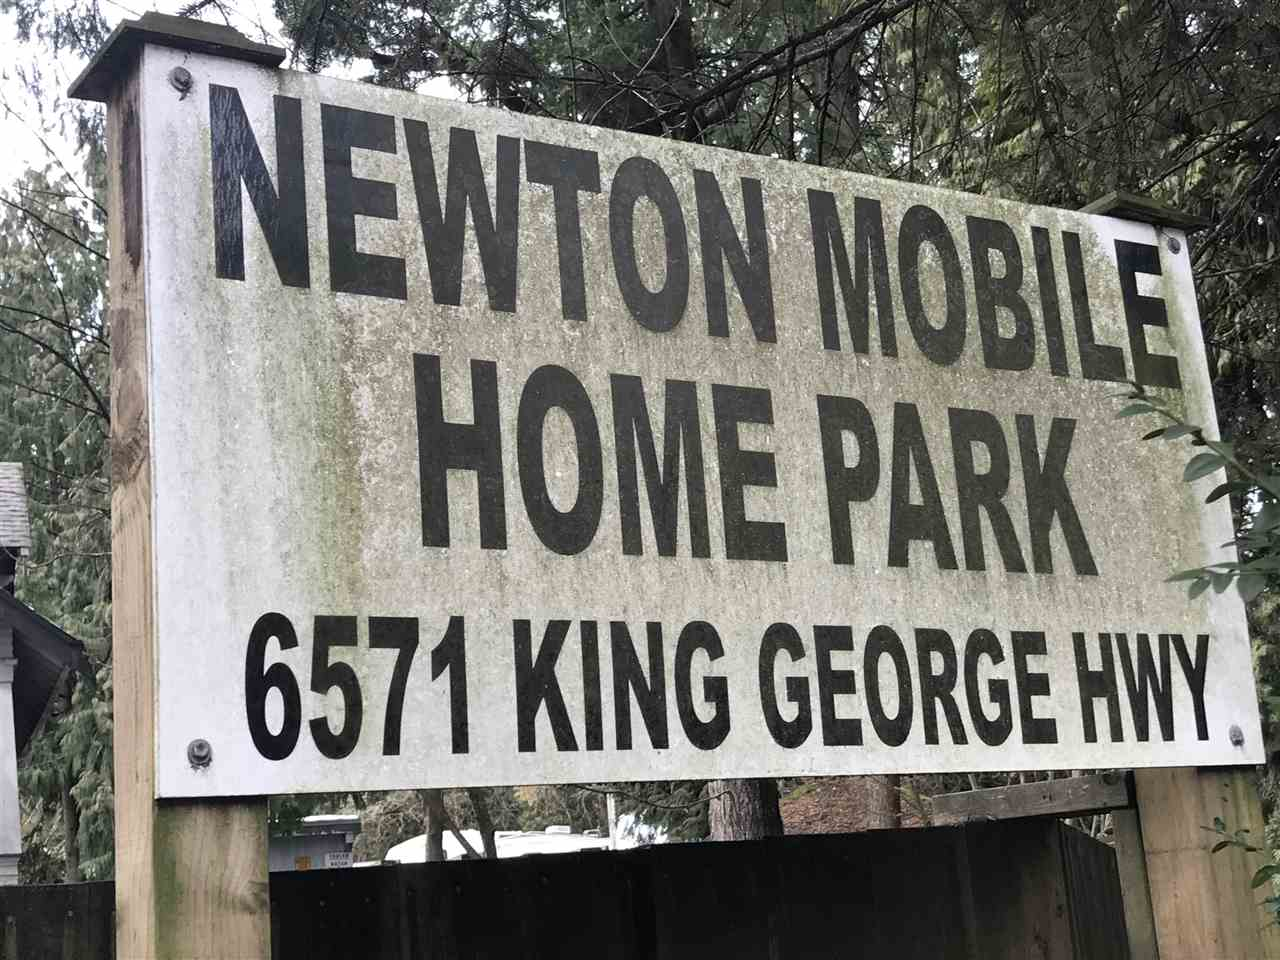 6571 KING GEORGE BOULEVARD, Surrey, BC, V3W 4Z4 Photo 1